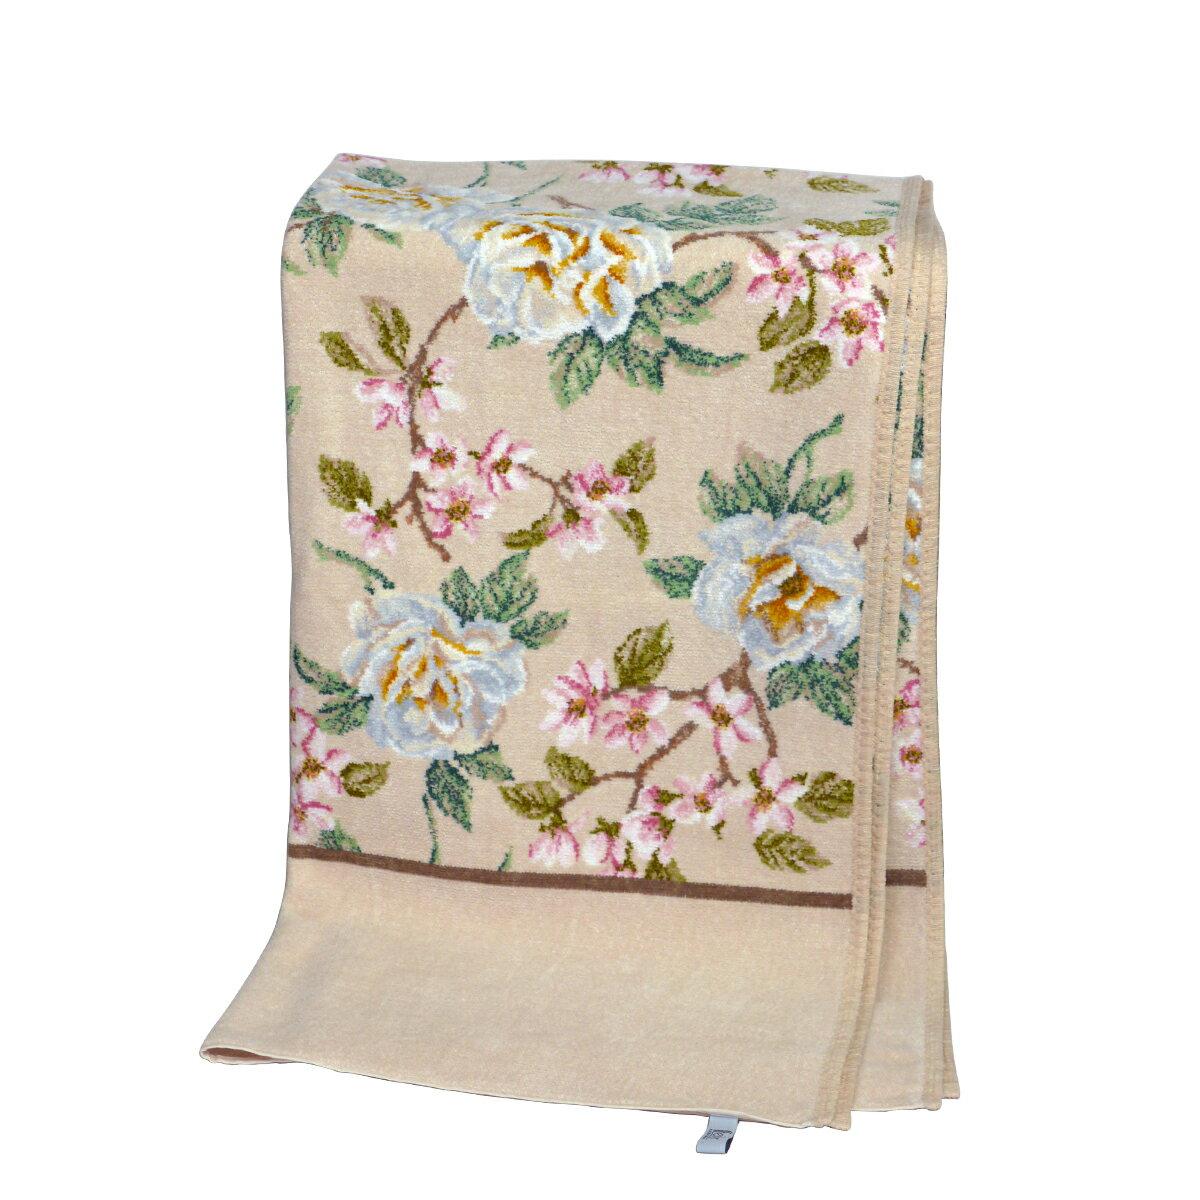 【Max1,000円OFFクーポン】フェイラー バスタオル バニラローズ FEILER 75x150cm FEILER Chenille Bath Towel Vanilla Rose ギフトに最適 日用品雑貨 ギフト・のし可